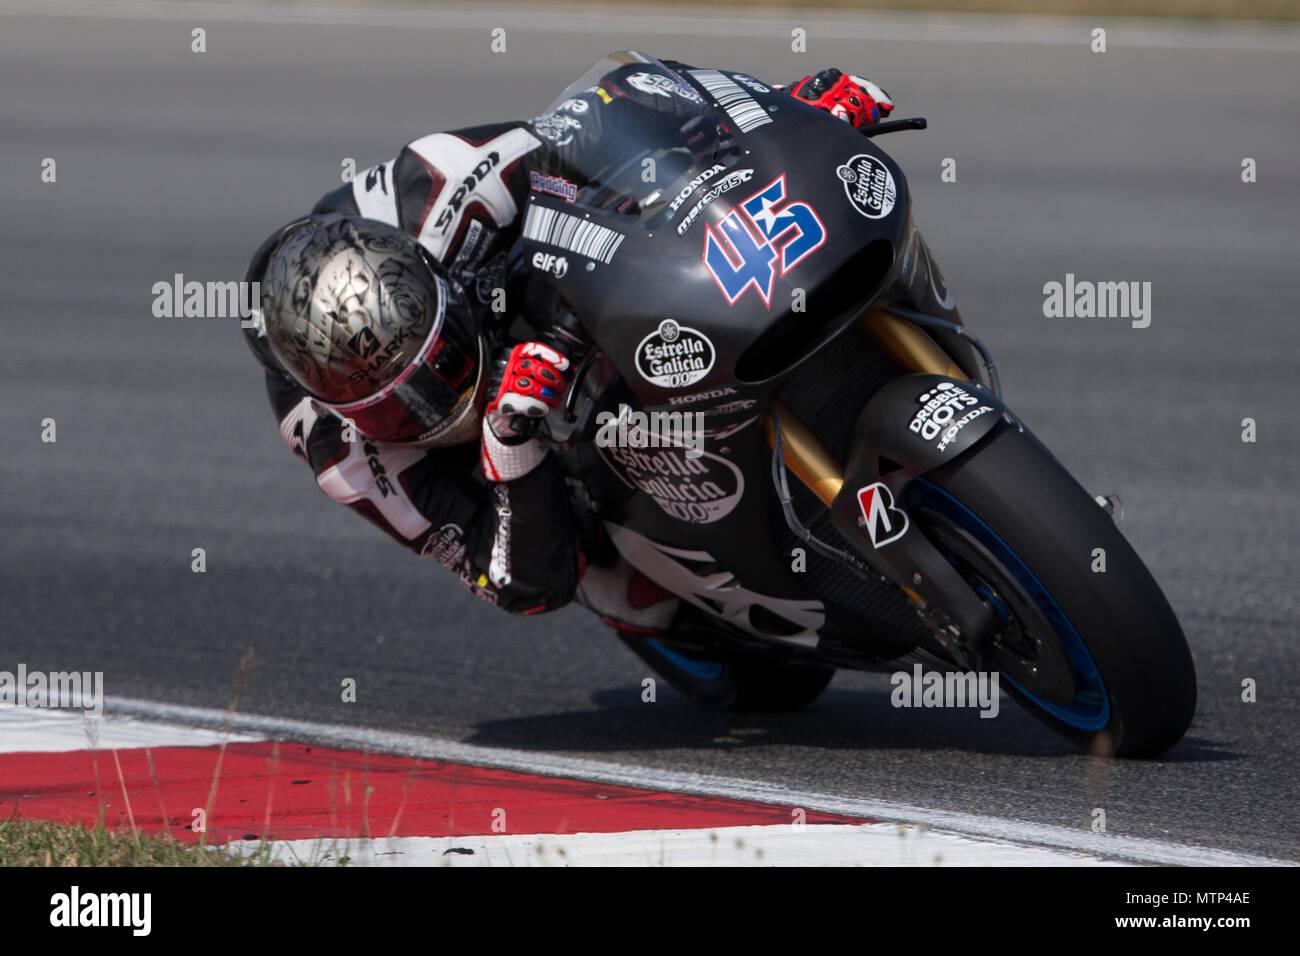 Britain's Scott Redding astride his Honda RCV factory race bike at the official MotoGP winter test at Sepang circuit in Malaysia. - Stock Image